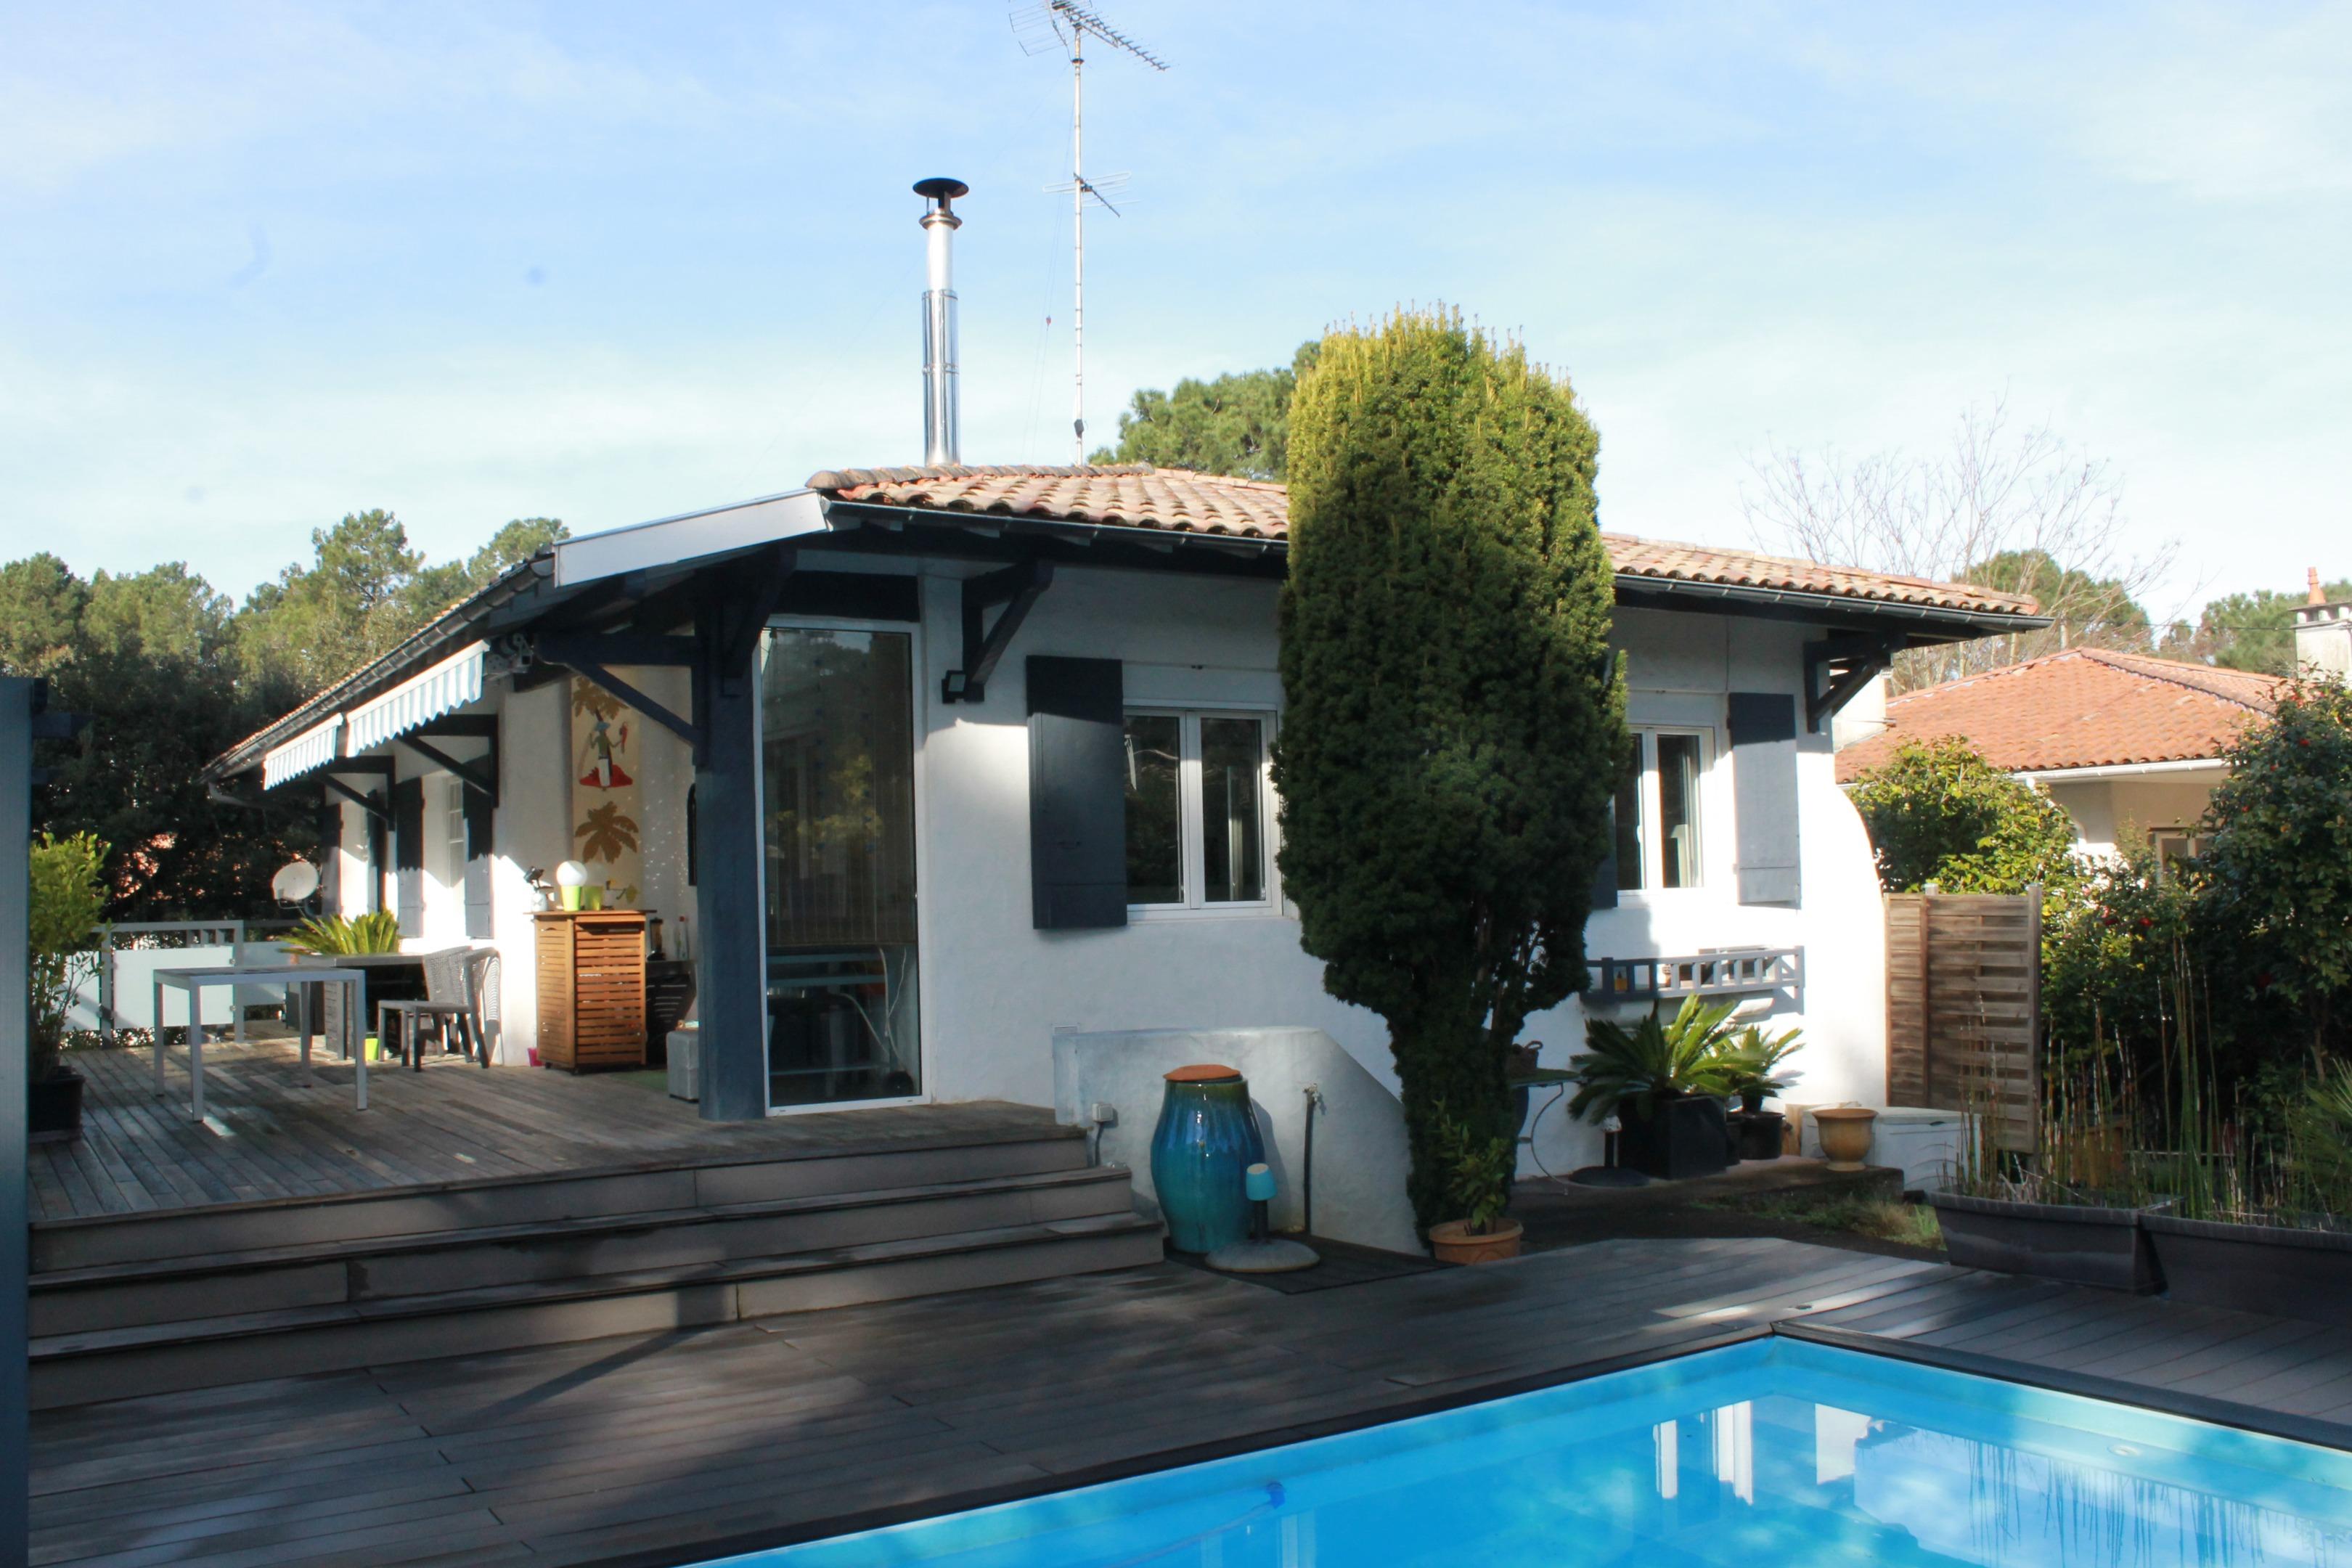 Vente au coeur des abatilles villa 5 chambres avec piscine - Chambre d hote piscine chauffee ...